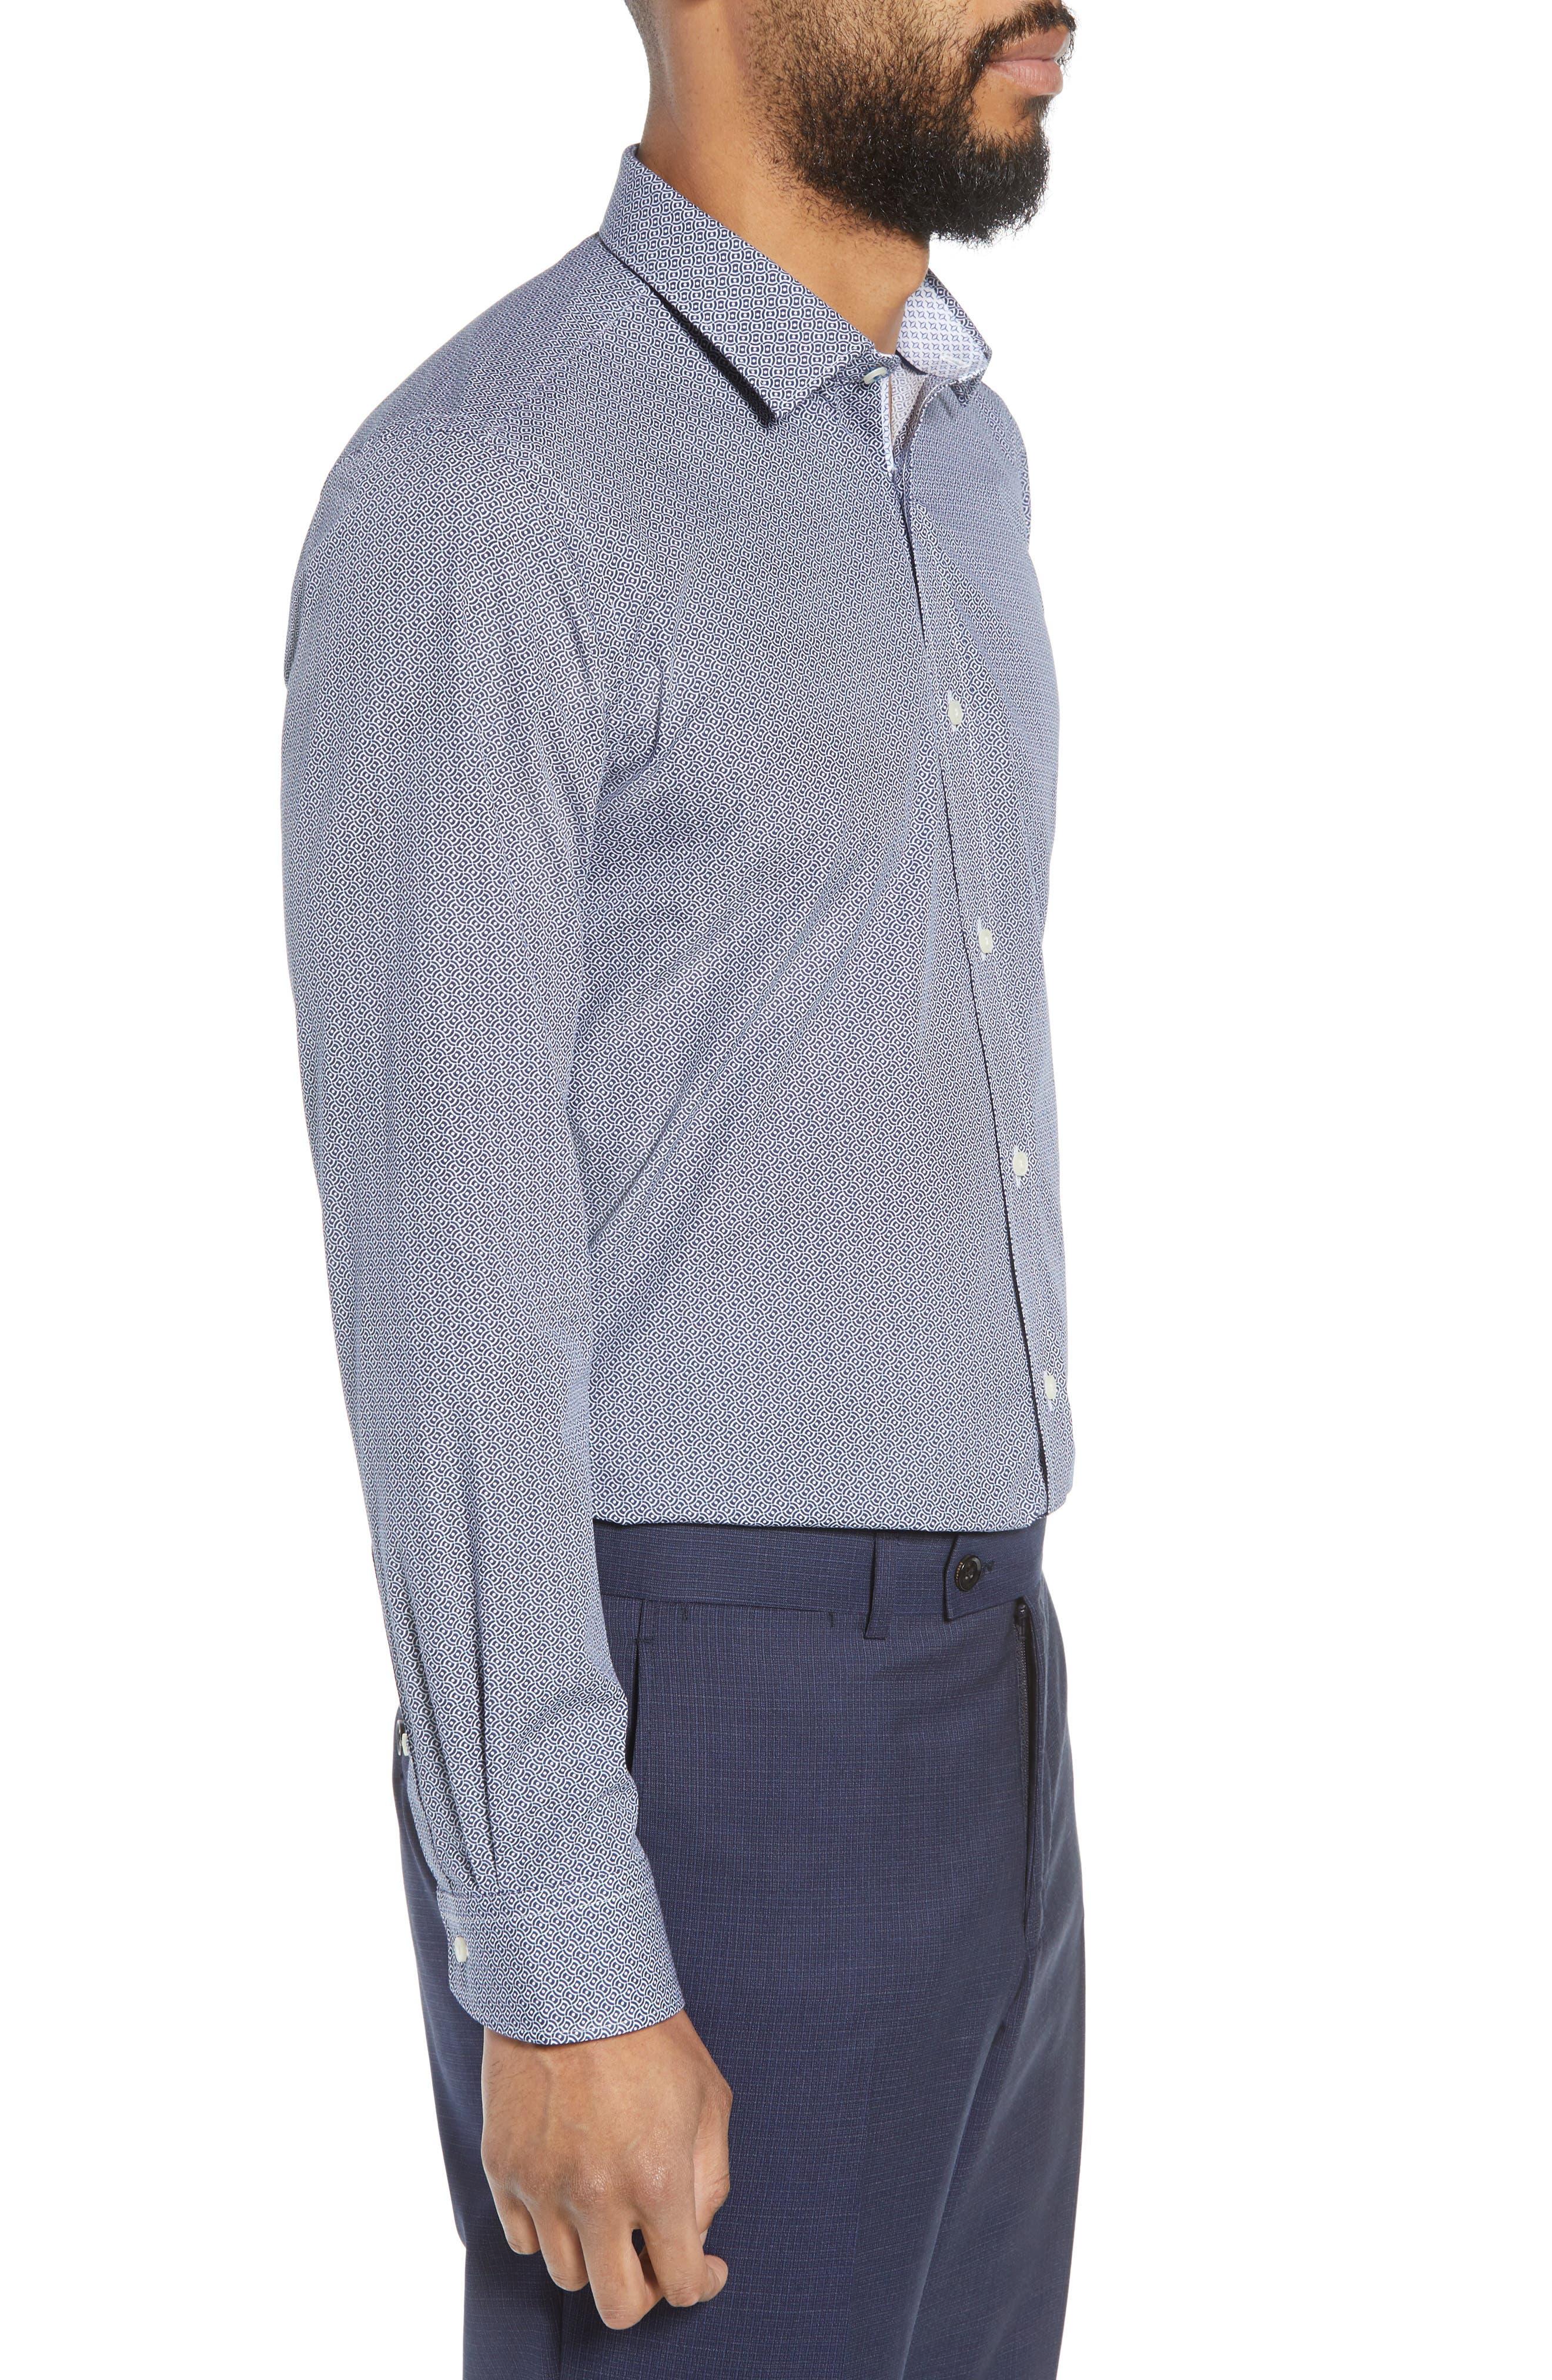 Footz Slim Fit Geometric Dress Shirt,                             Alternate thumbnail 4, color,                             NAVY